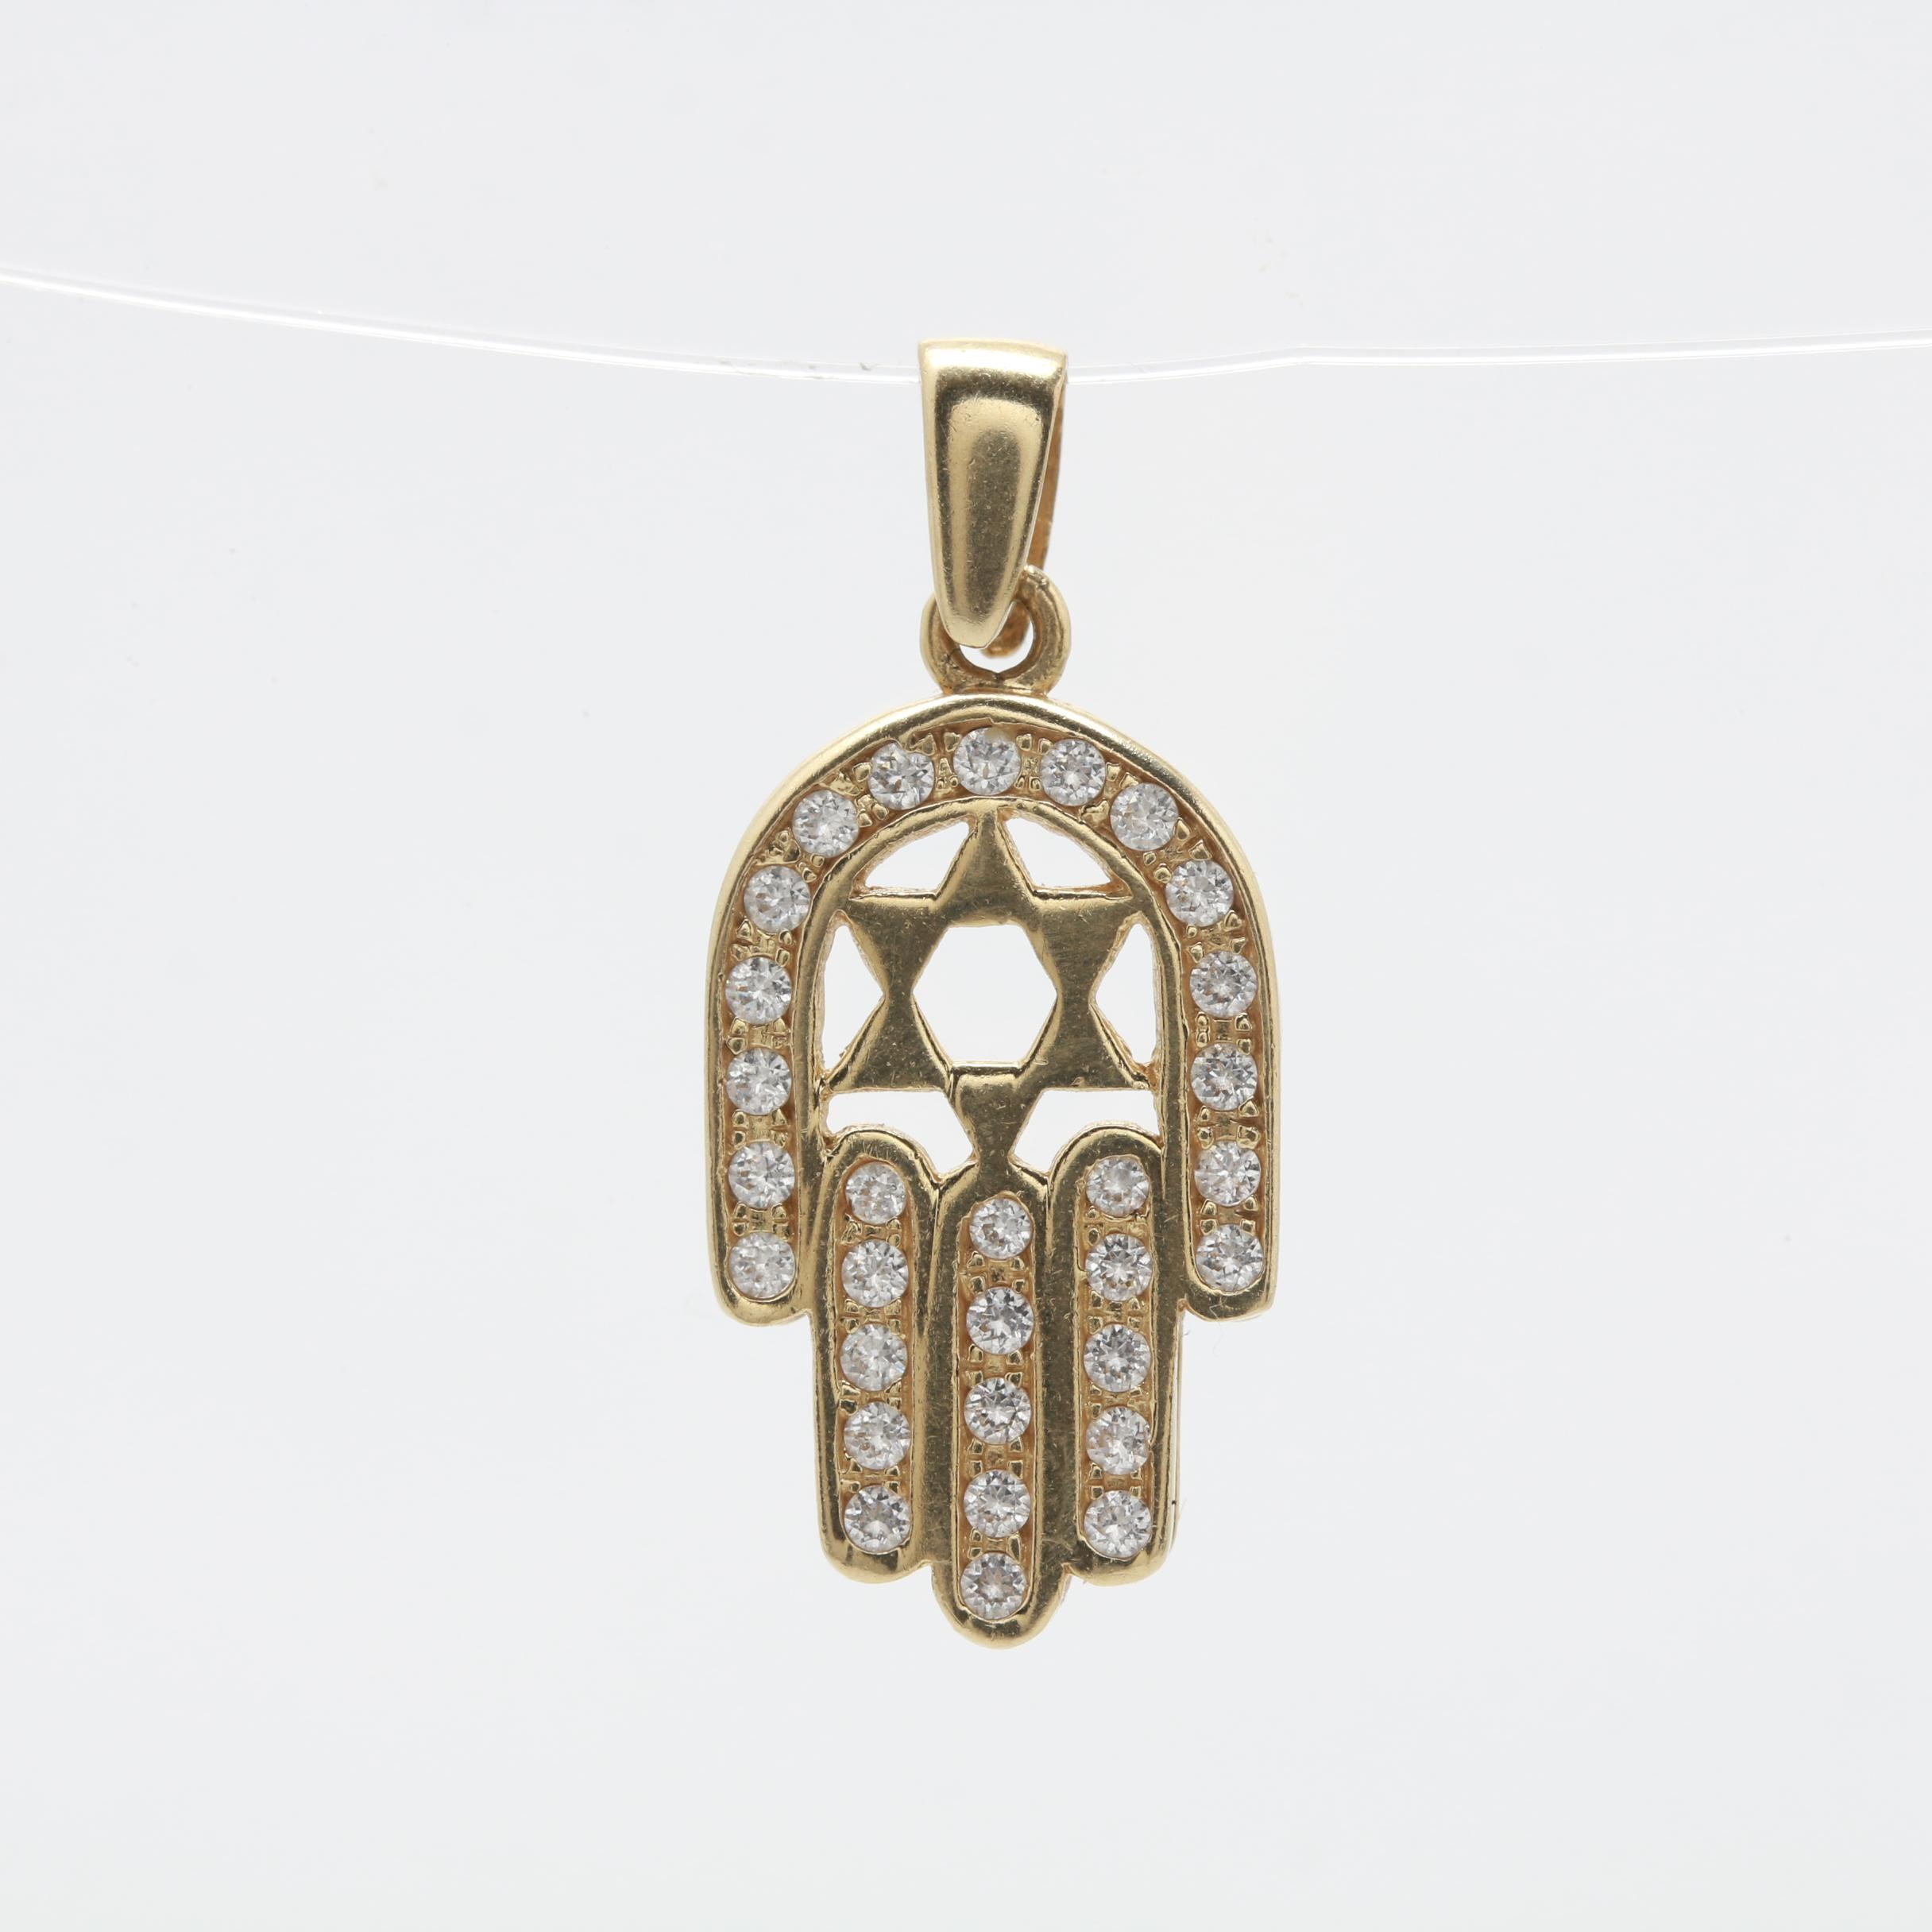 14K Yellow Gold Cubic Zirconia Hamsa Hand Pendant